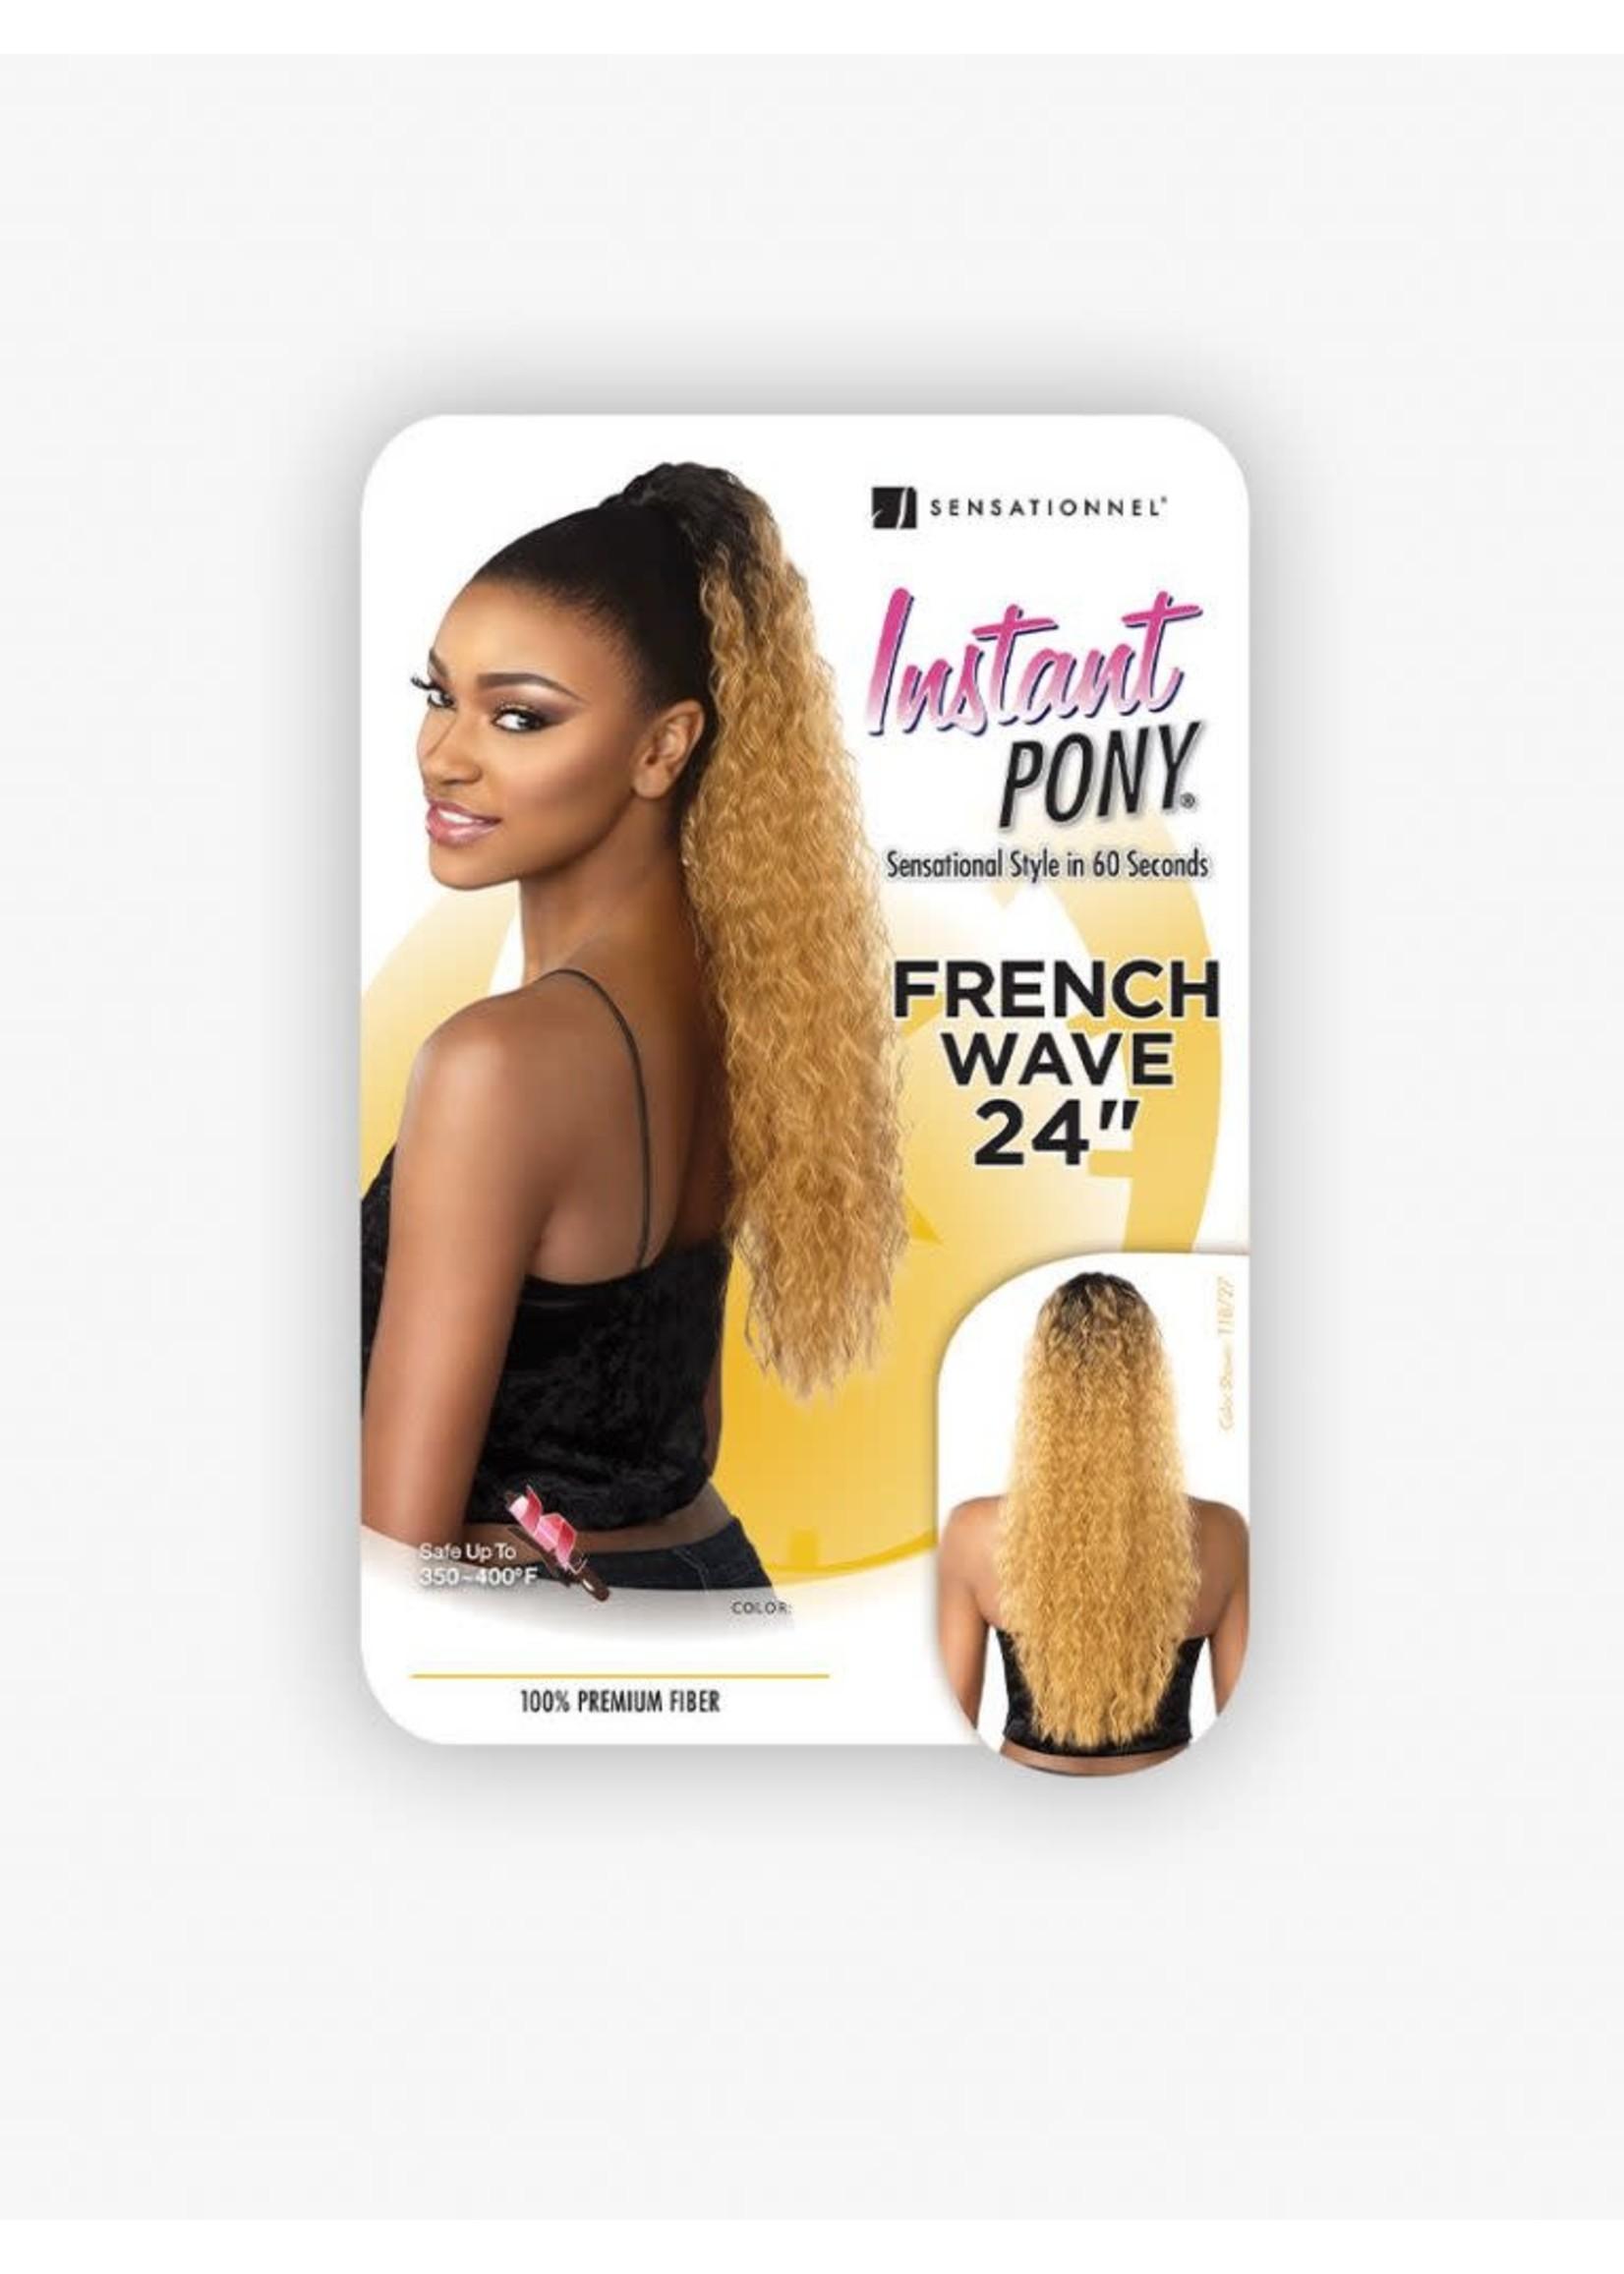 "Sensationnel Instant Pony French Wave 24"""